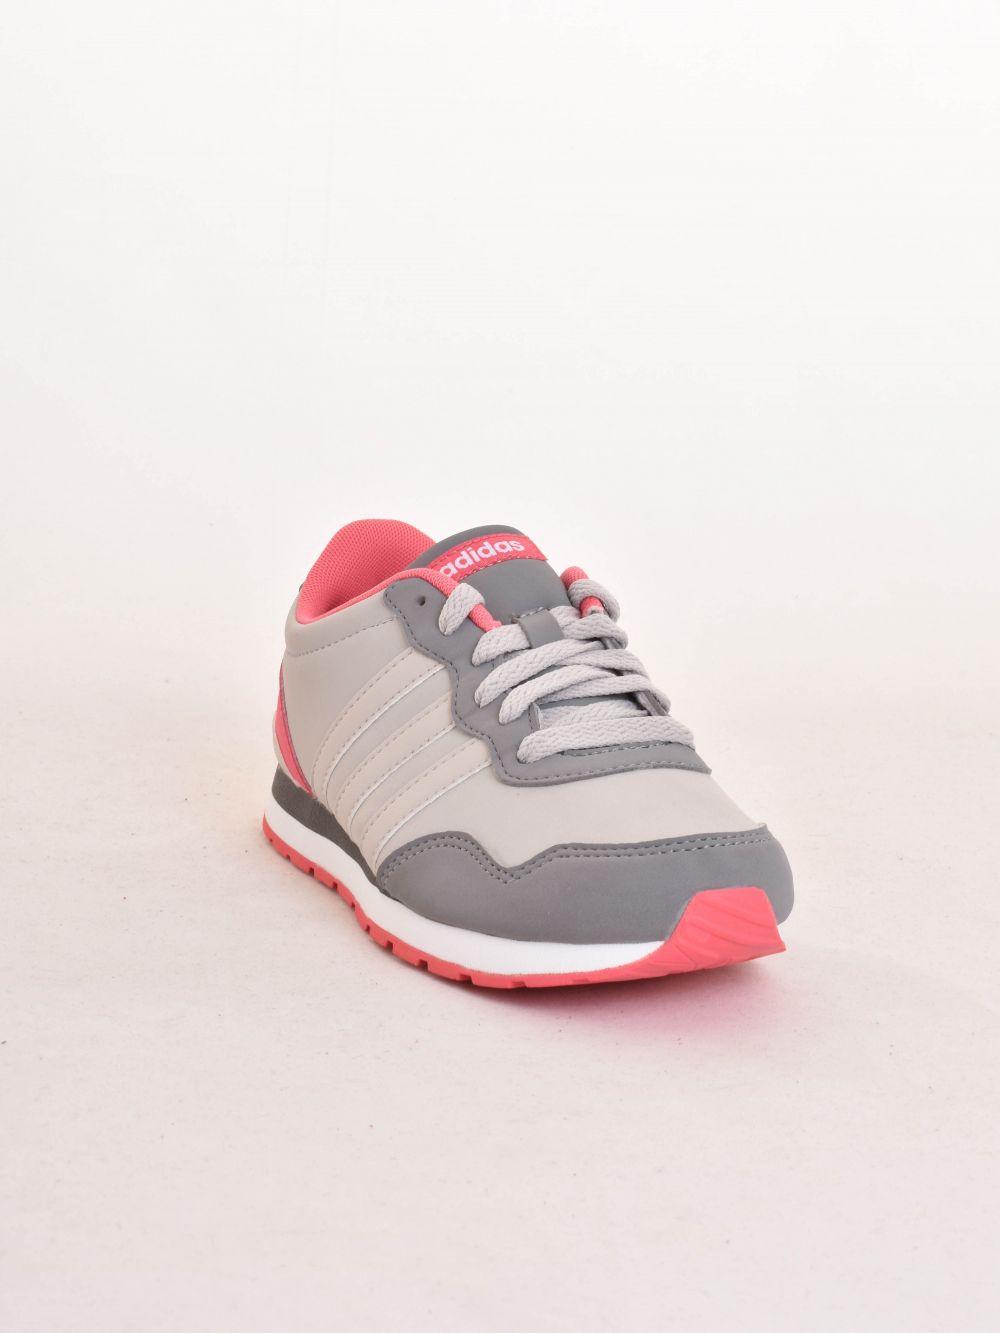 Adidas lány cipő V JOG K ... f3facc67e5